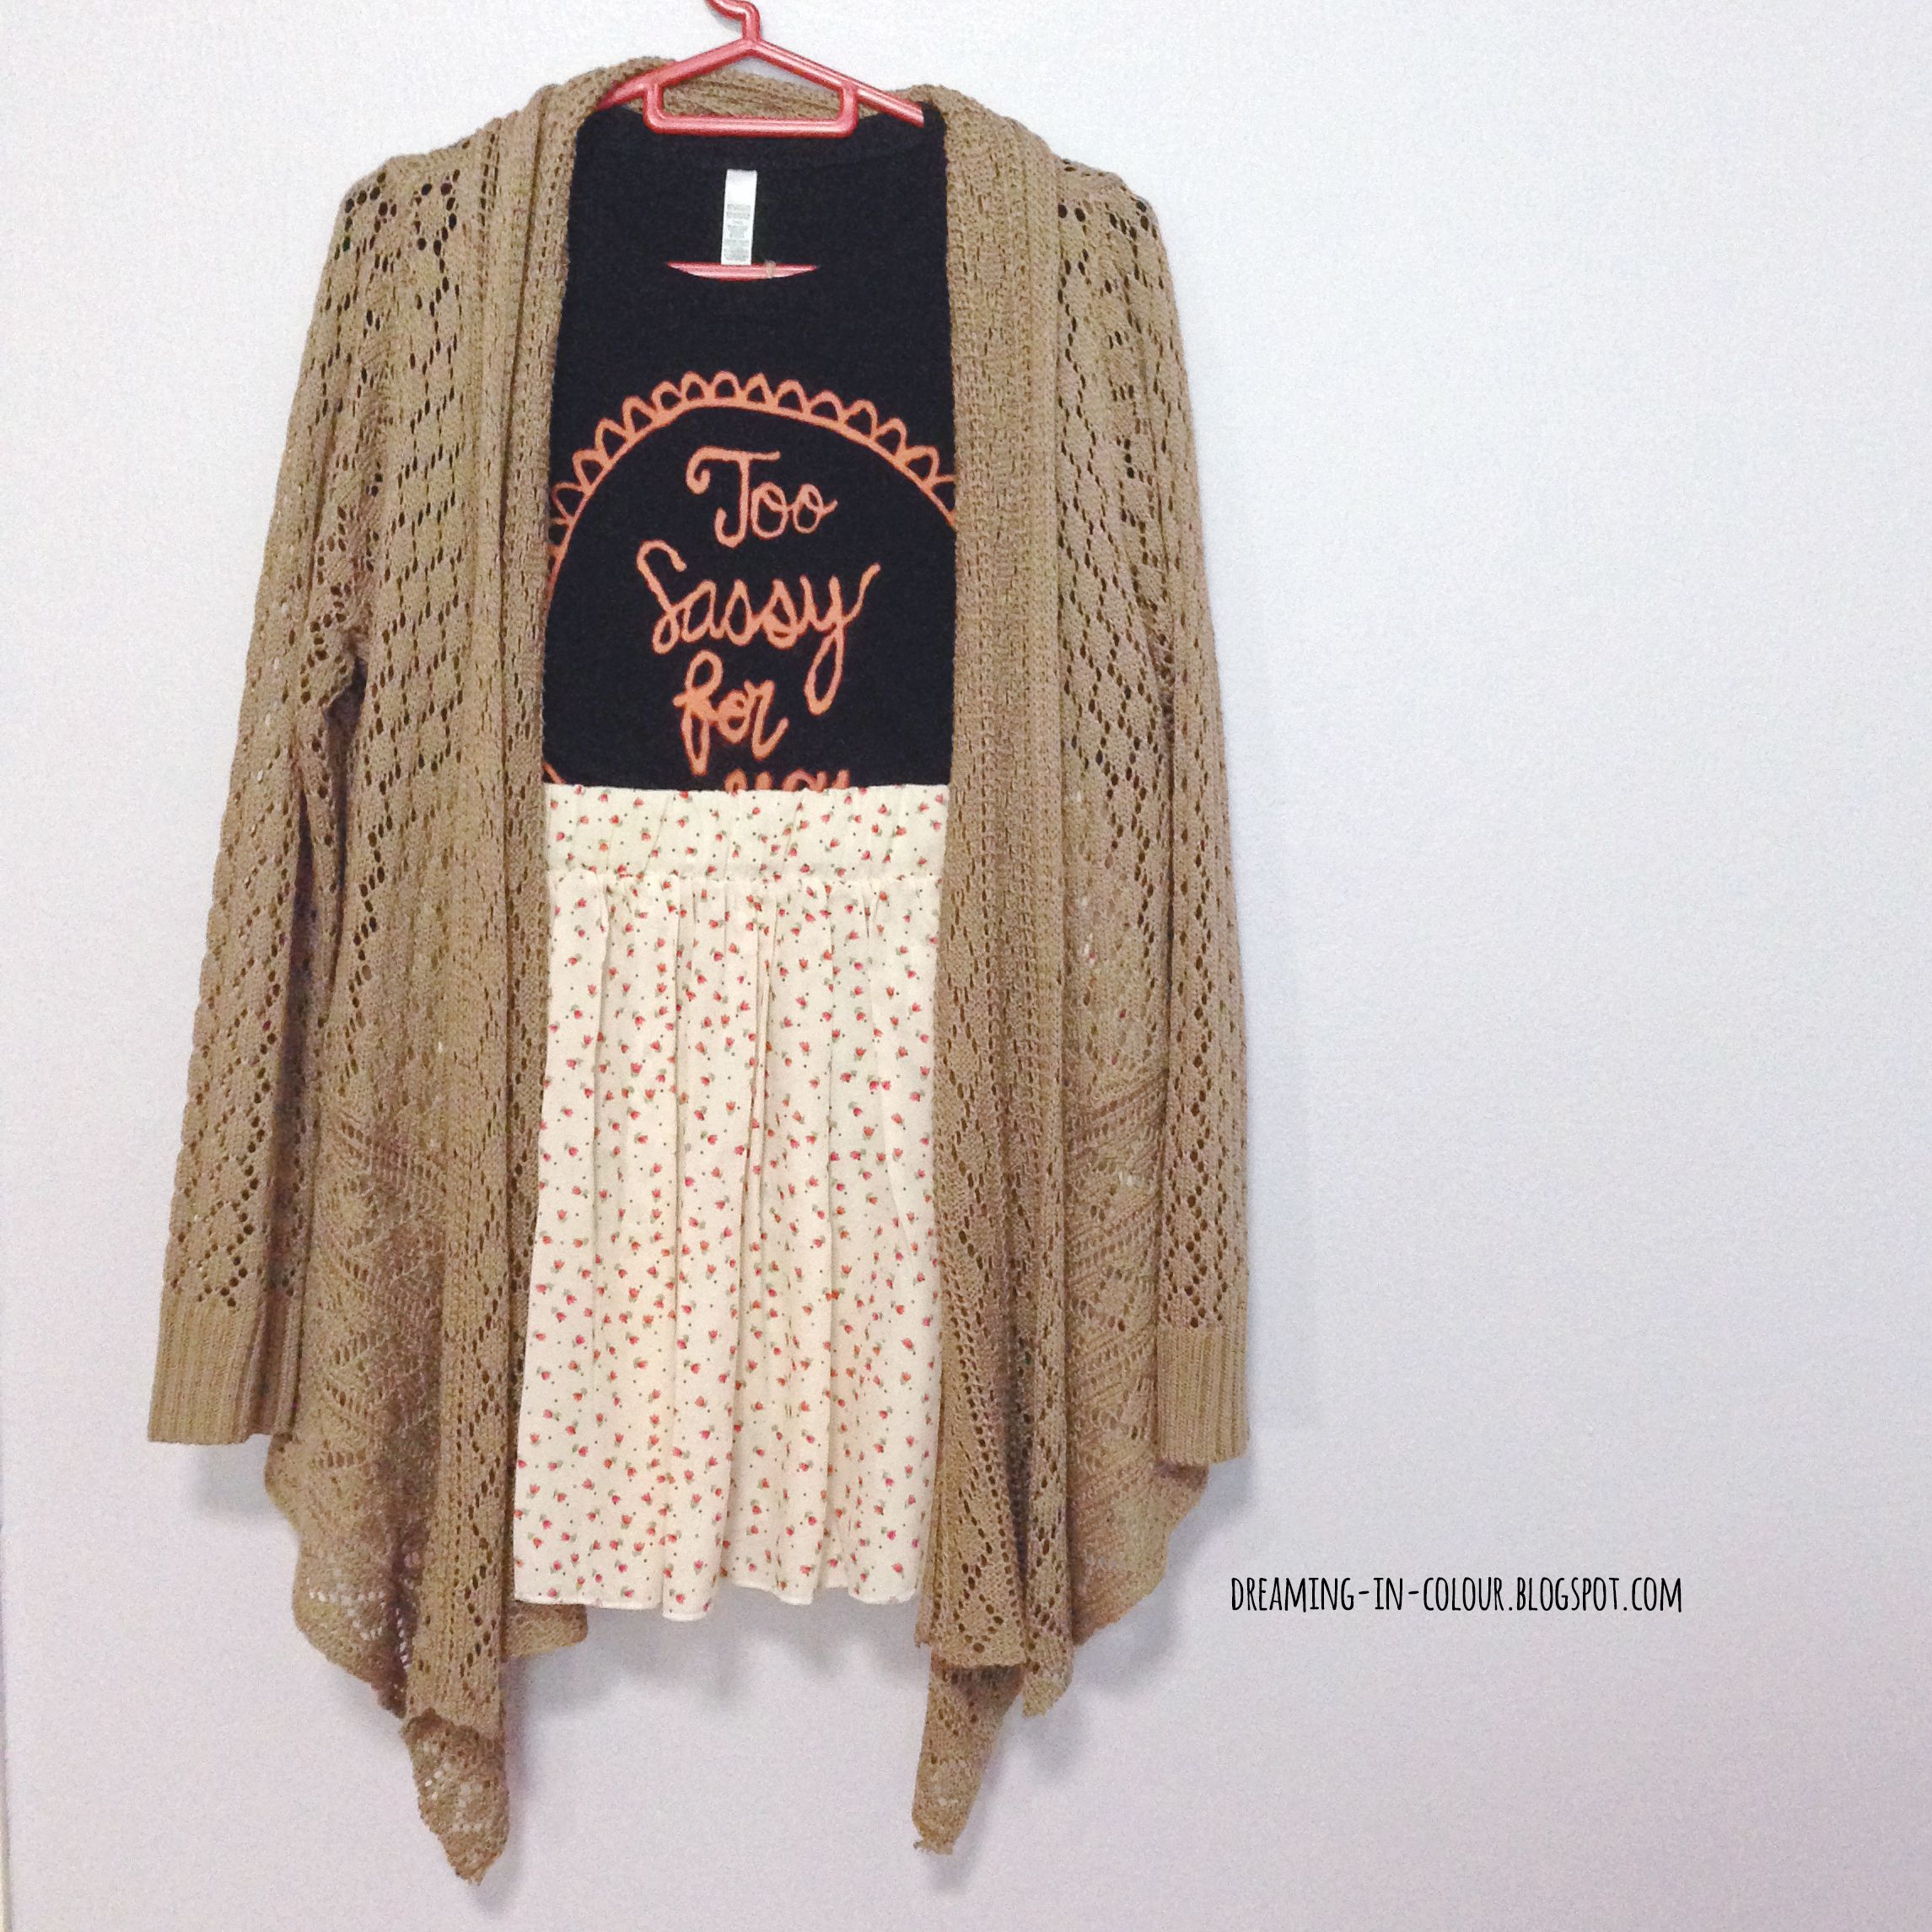 Diy Brandy Melville Inspired Shirt With Clorox Bleach Pen Too